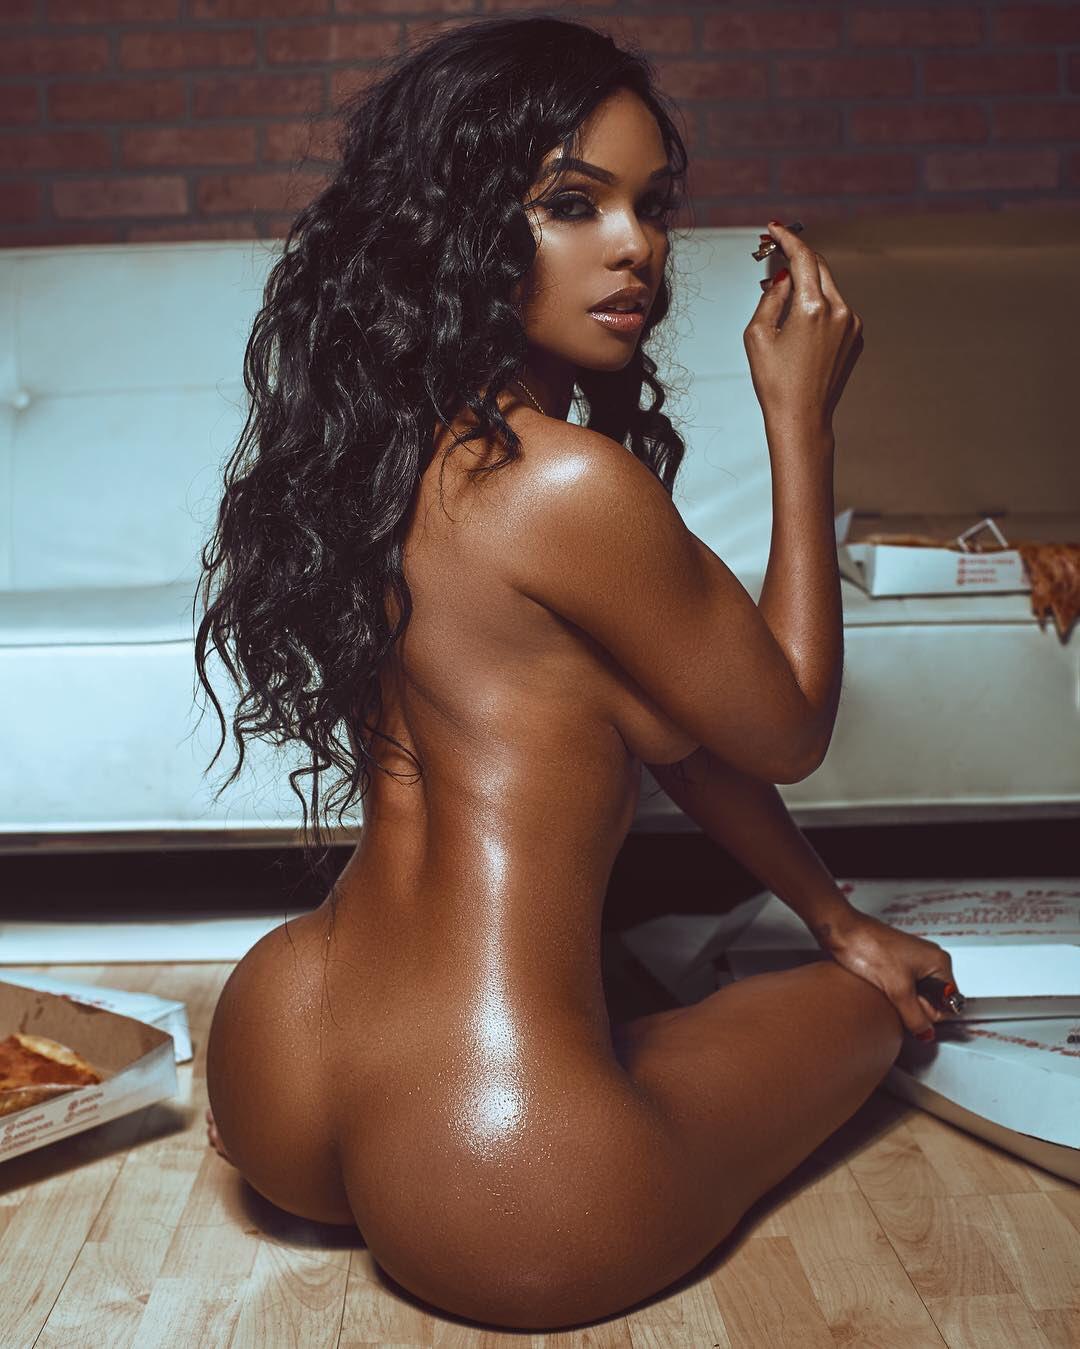 Two black girls naked — photo 8